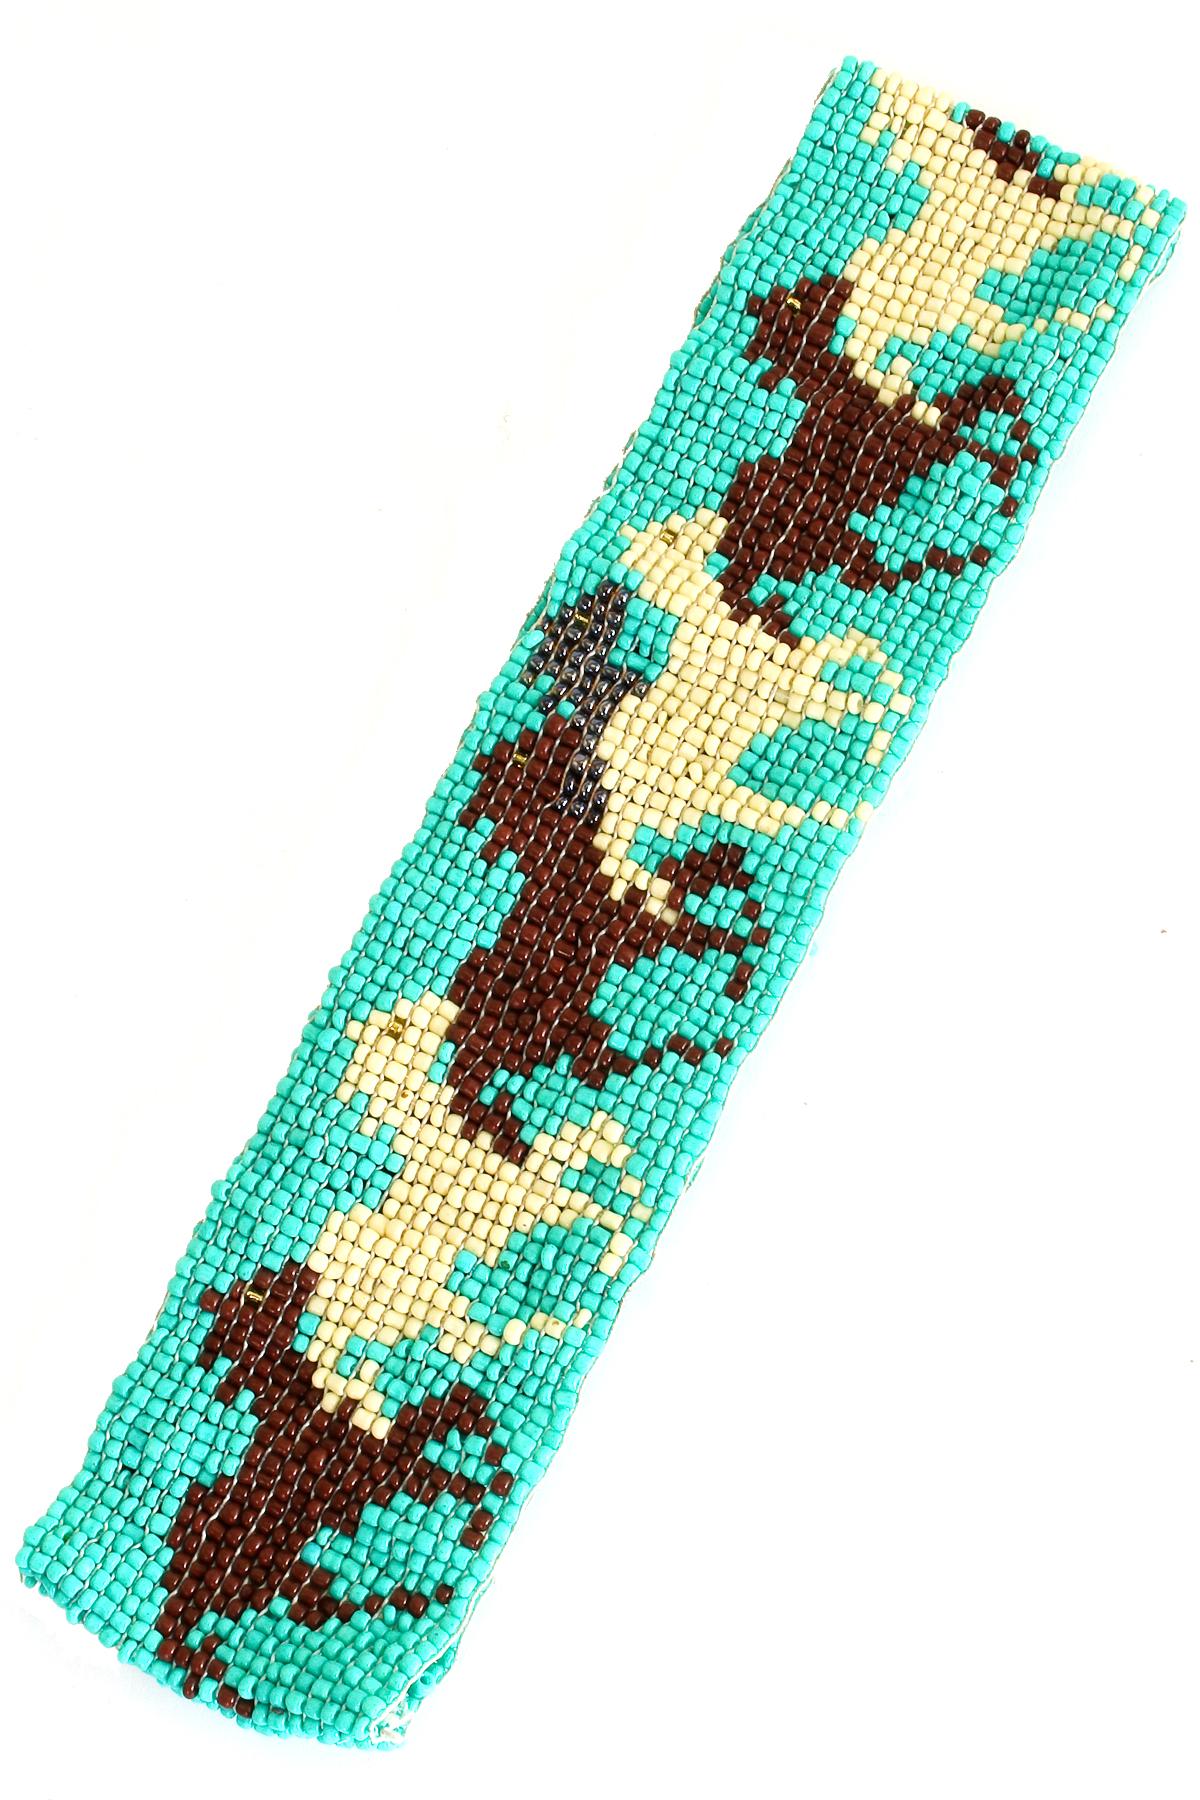 seed bead pattern headband hair accessories